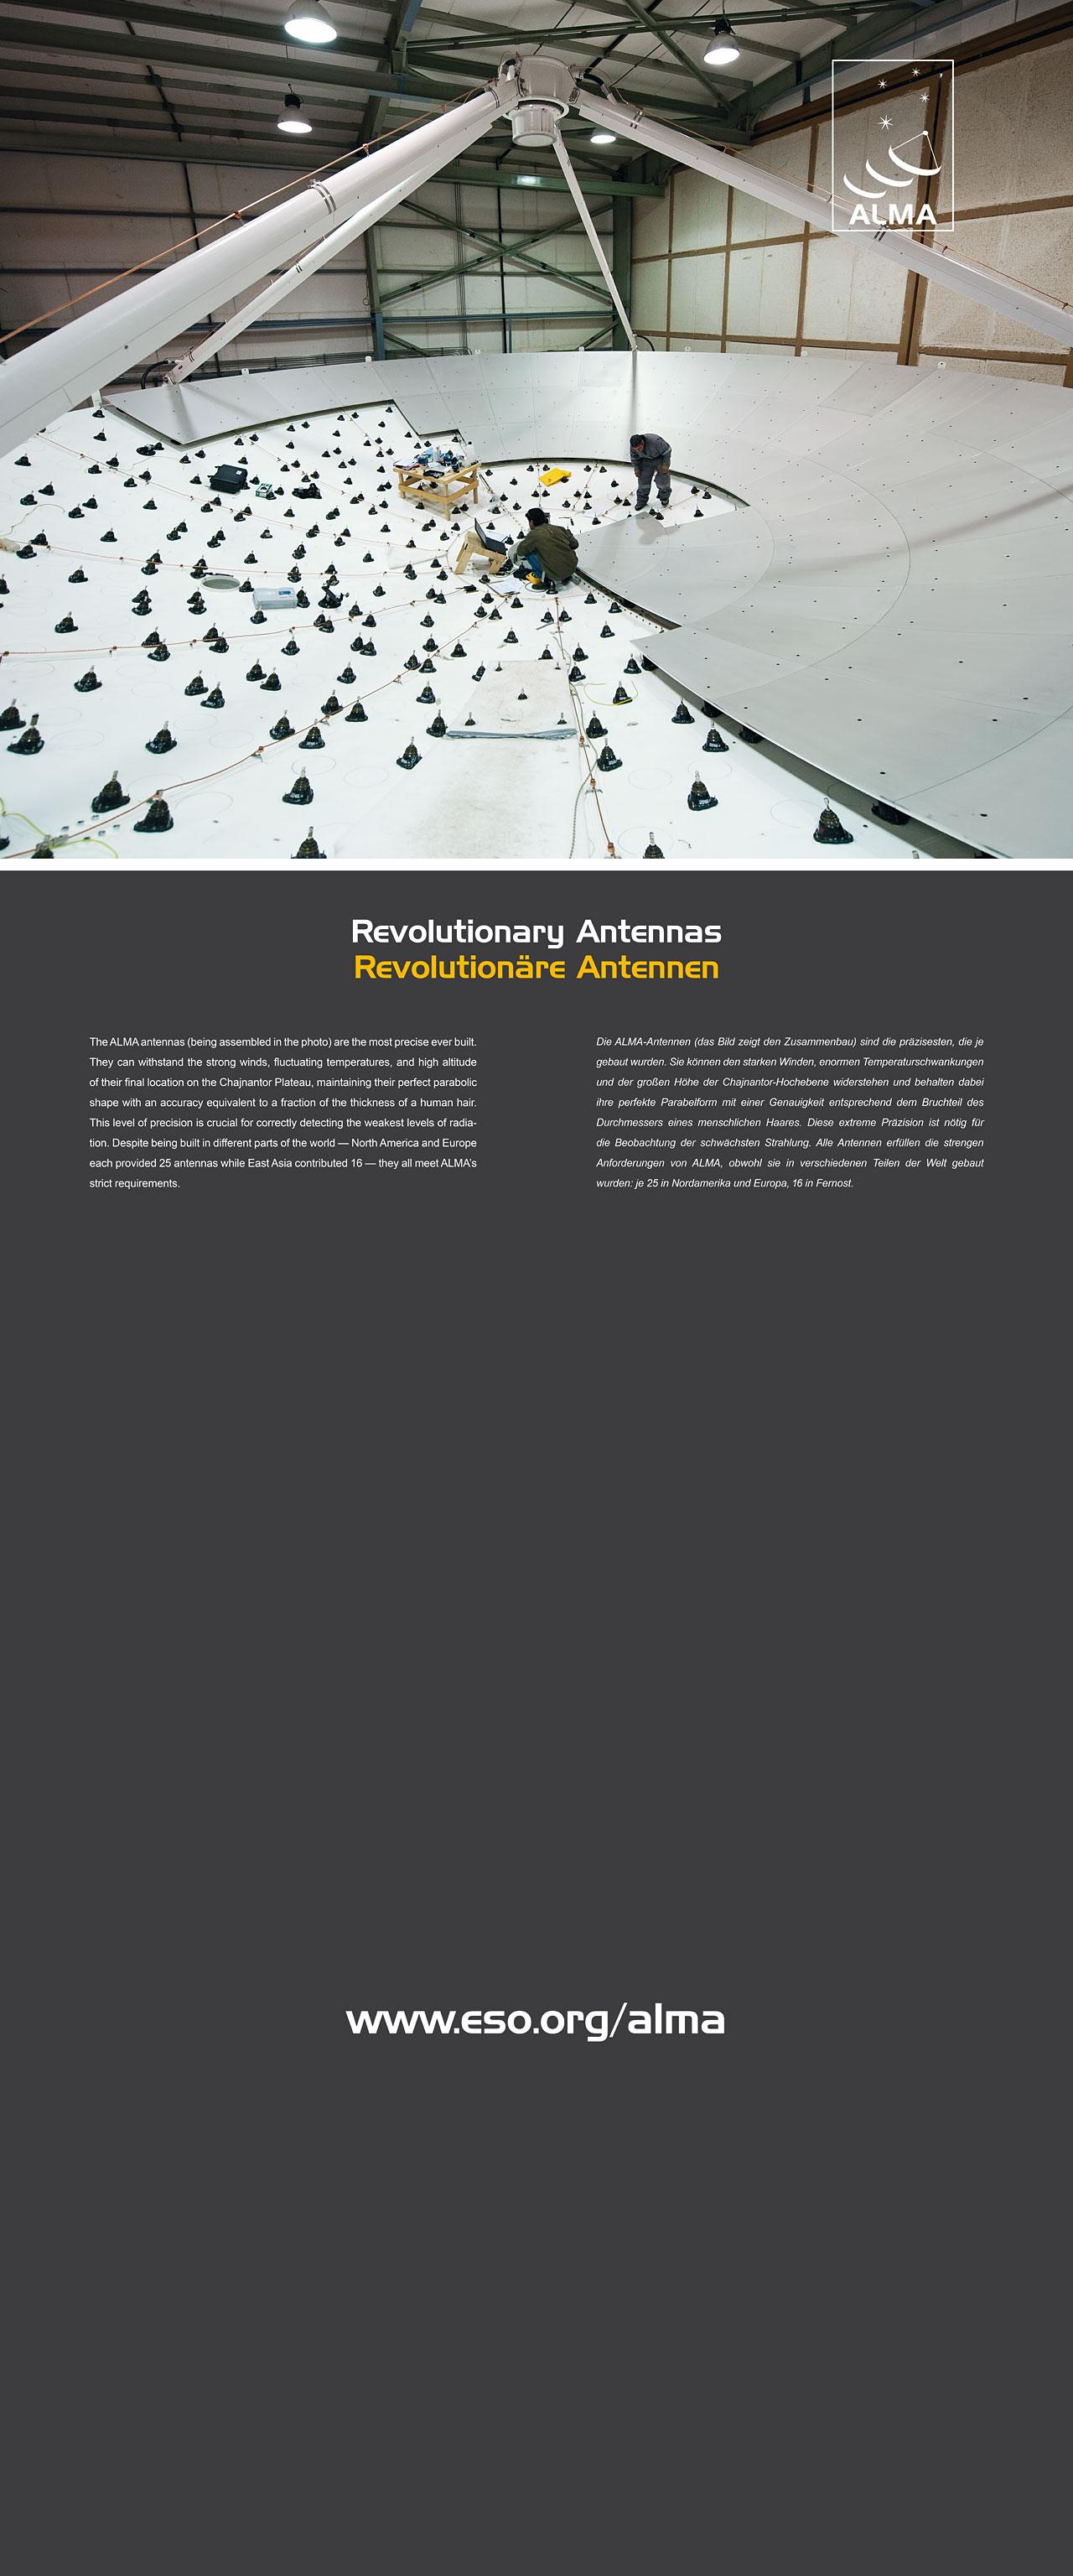 Alma Antennas Exhibition Panel 90 X 216 Cm English And German